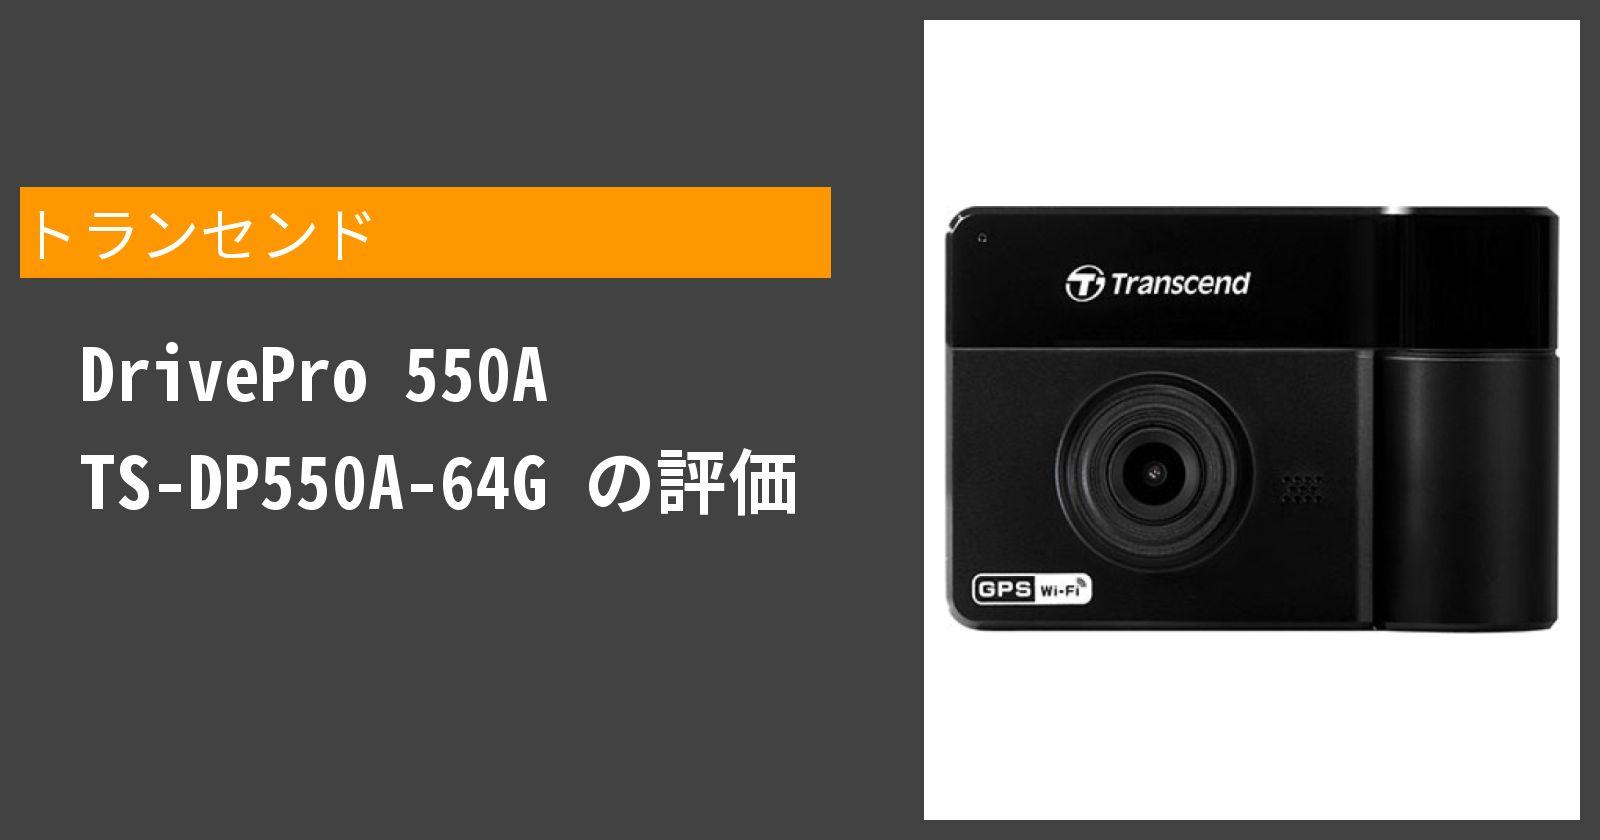 DrivePro 550A TS-DP550A-64Gを徹底評価